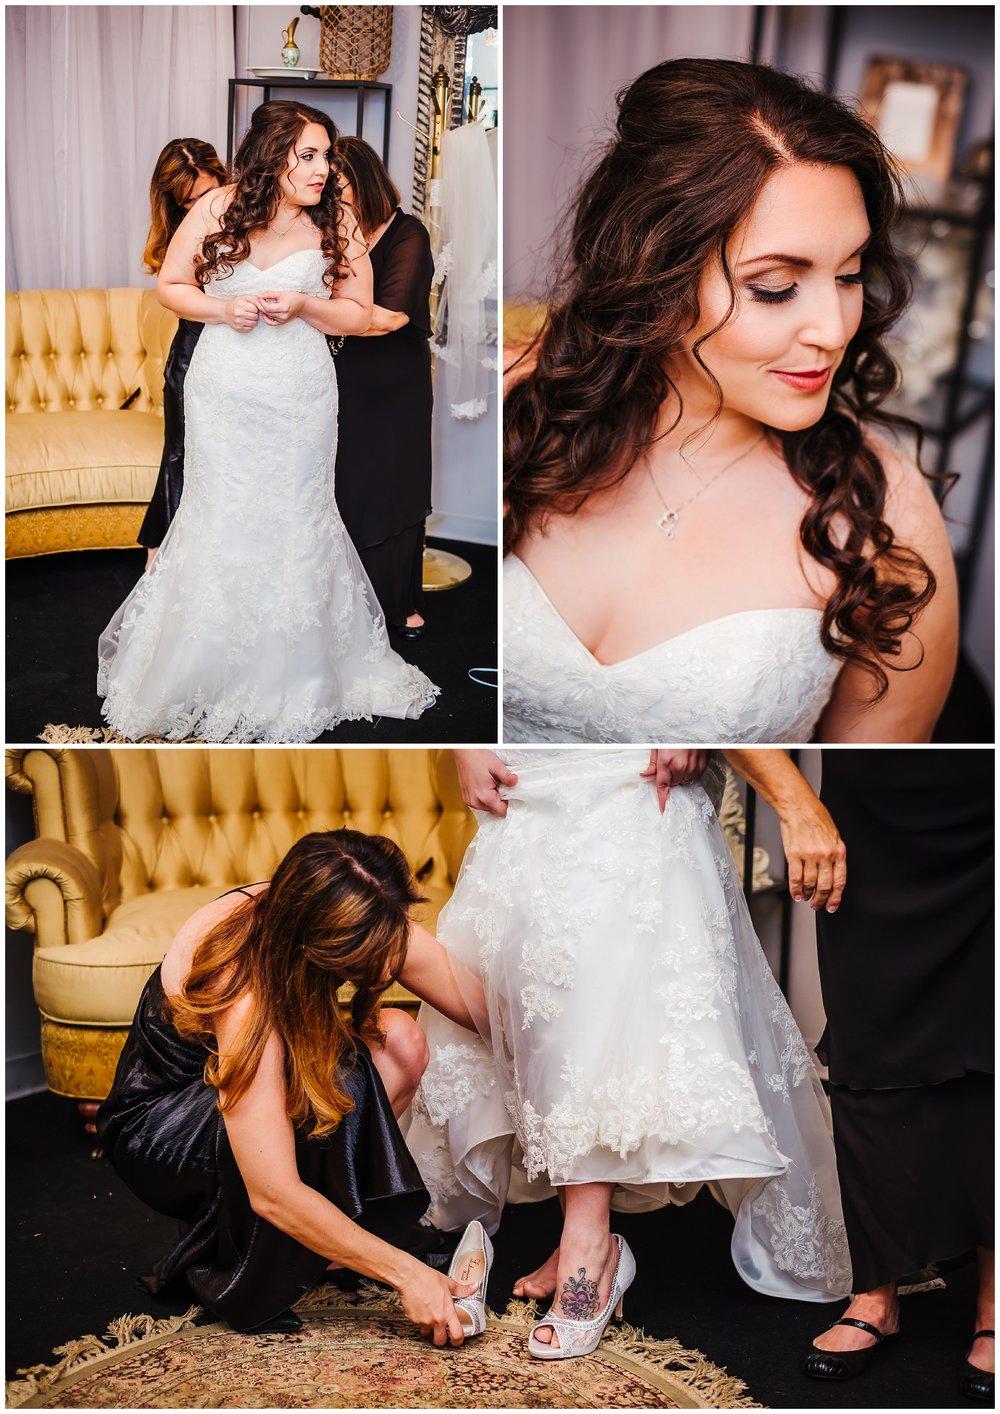 tampa-wedding-photographer-unique-indoor-venue_0011.jpg